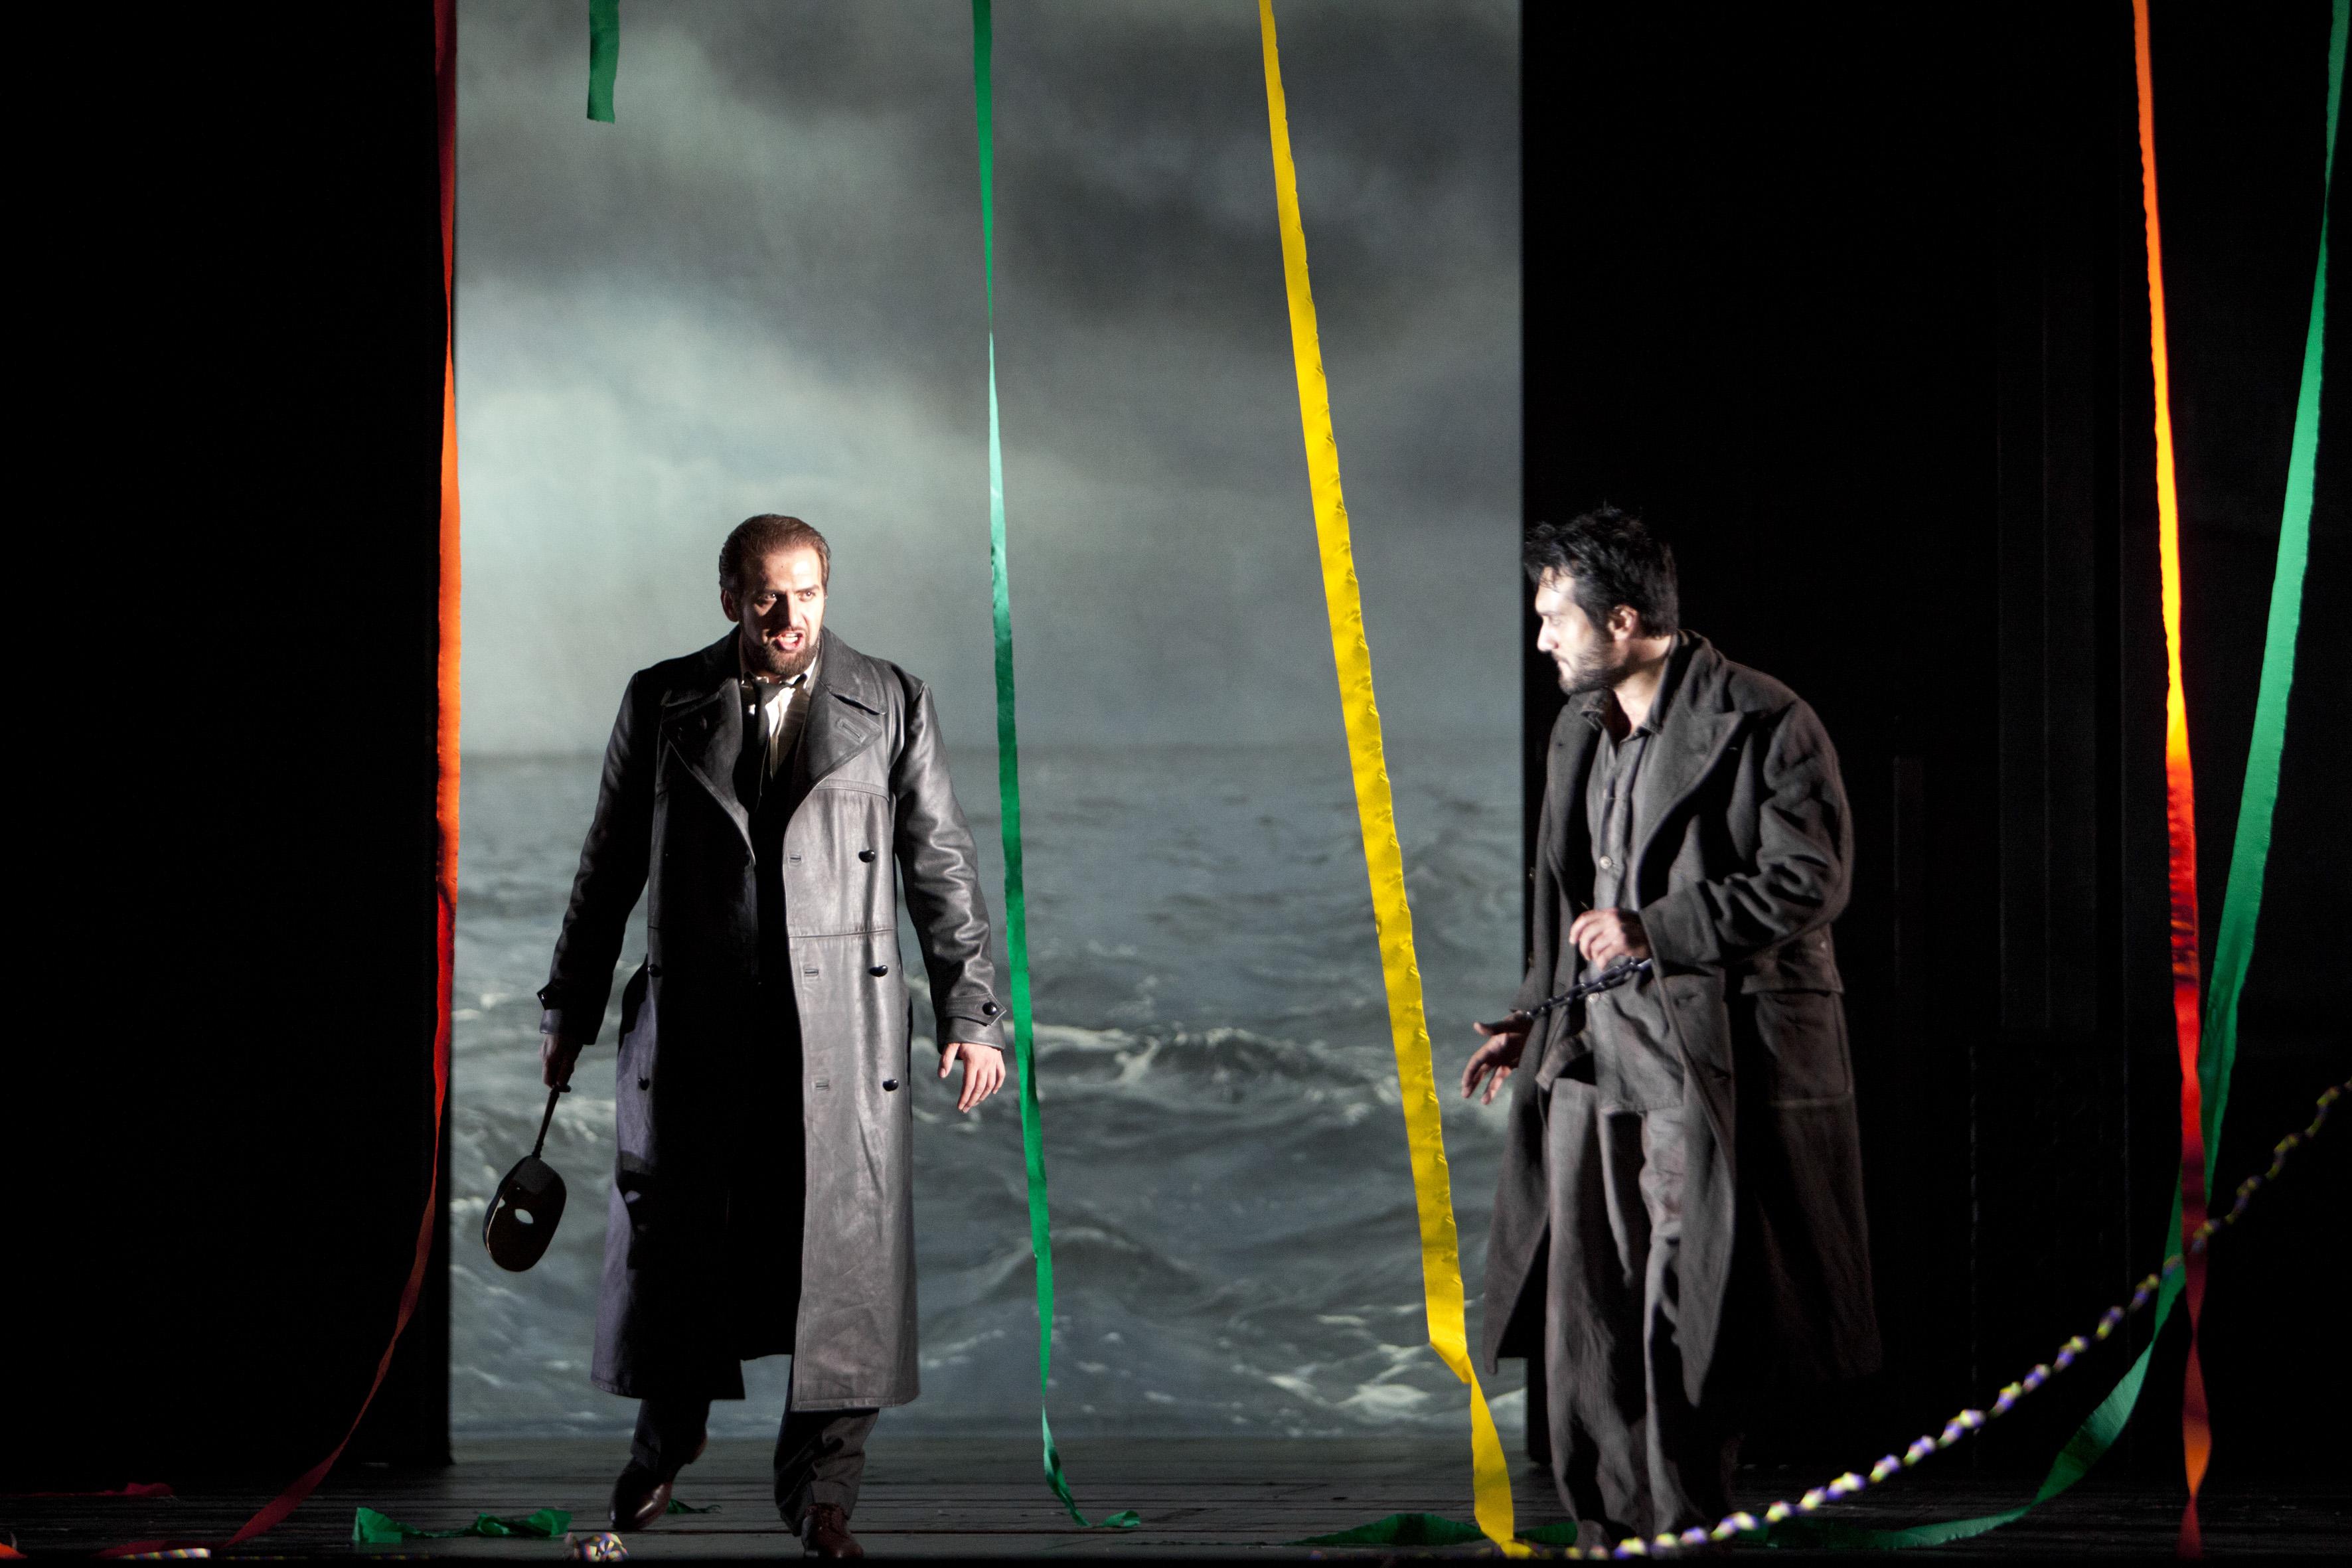 CRÍTICA: 'I due foscari' (Staatsoper de Hamburgo, 16/11/2013)